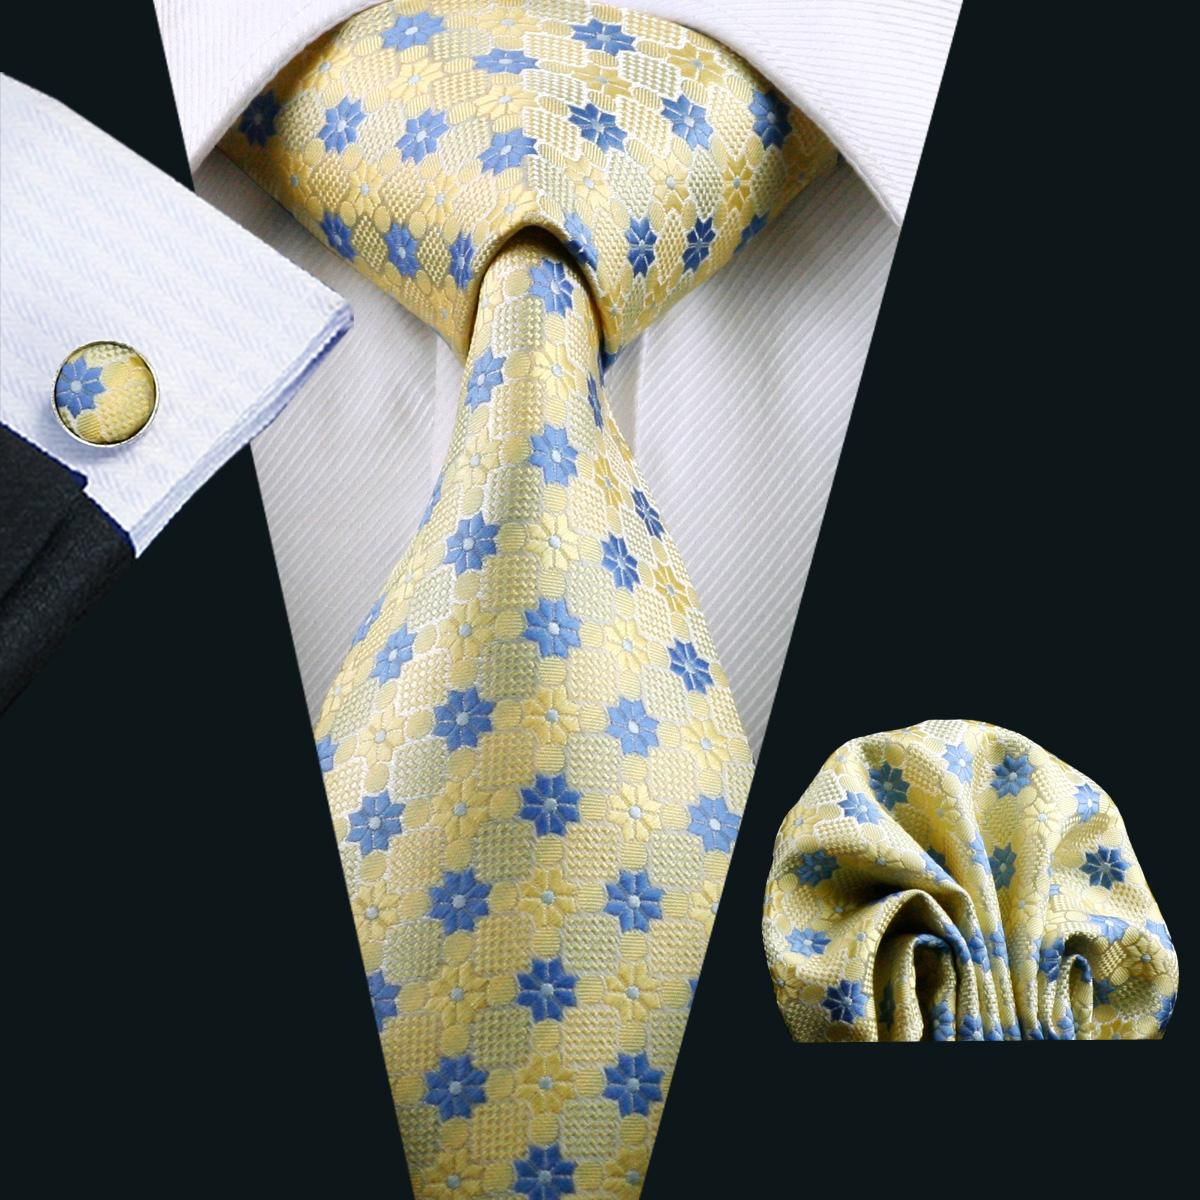 Neck Tie Set Pocket Square Cufflinks Set Yellow Blue Mix Color Mens Jacquard Woven Business Formal Necktie 8.5cm Width Casual Set N-1046